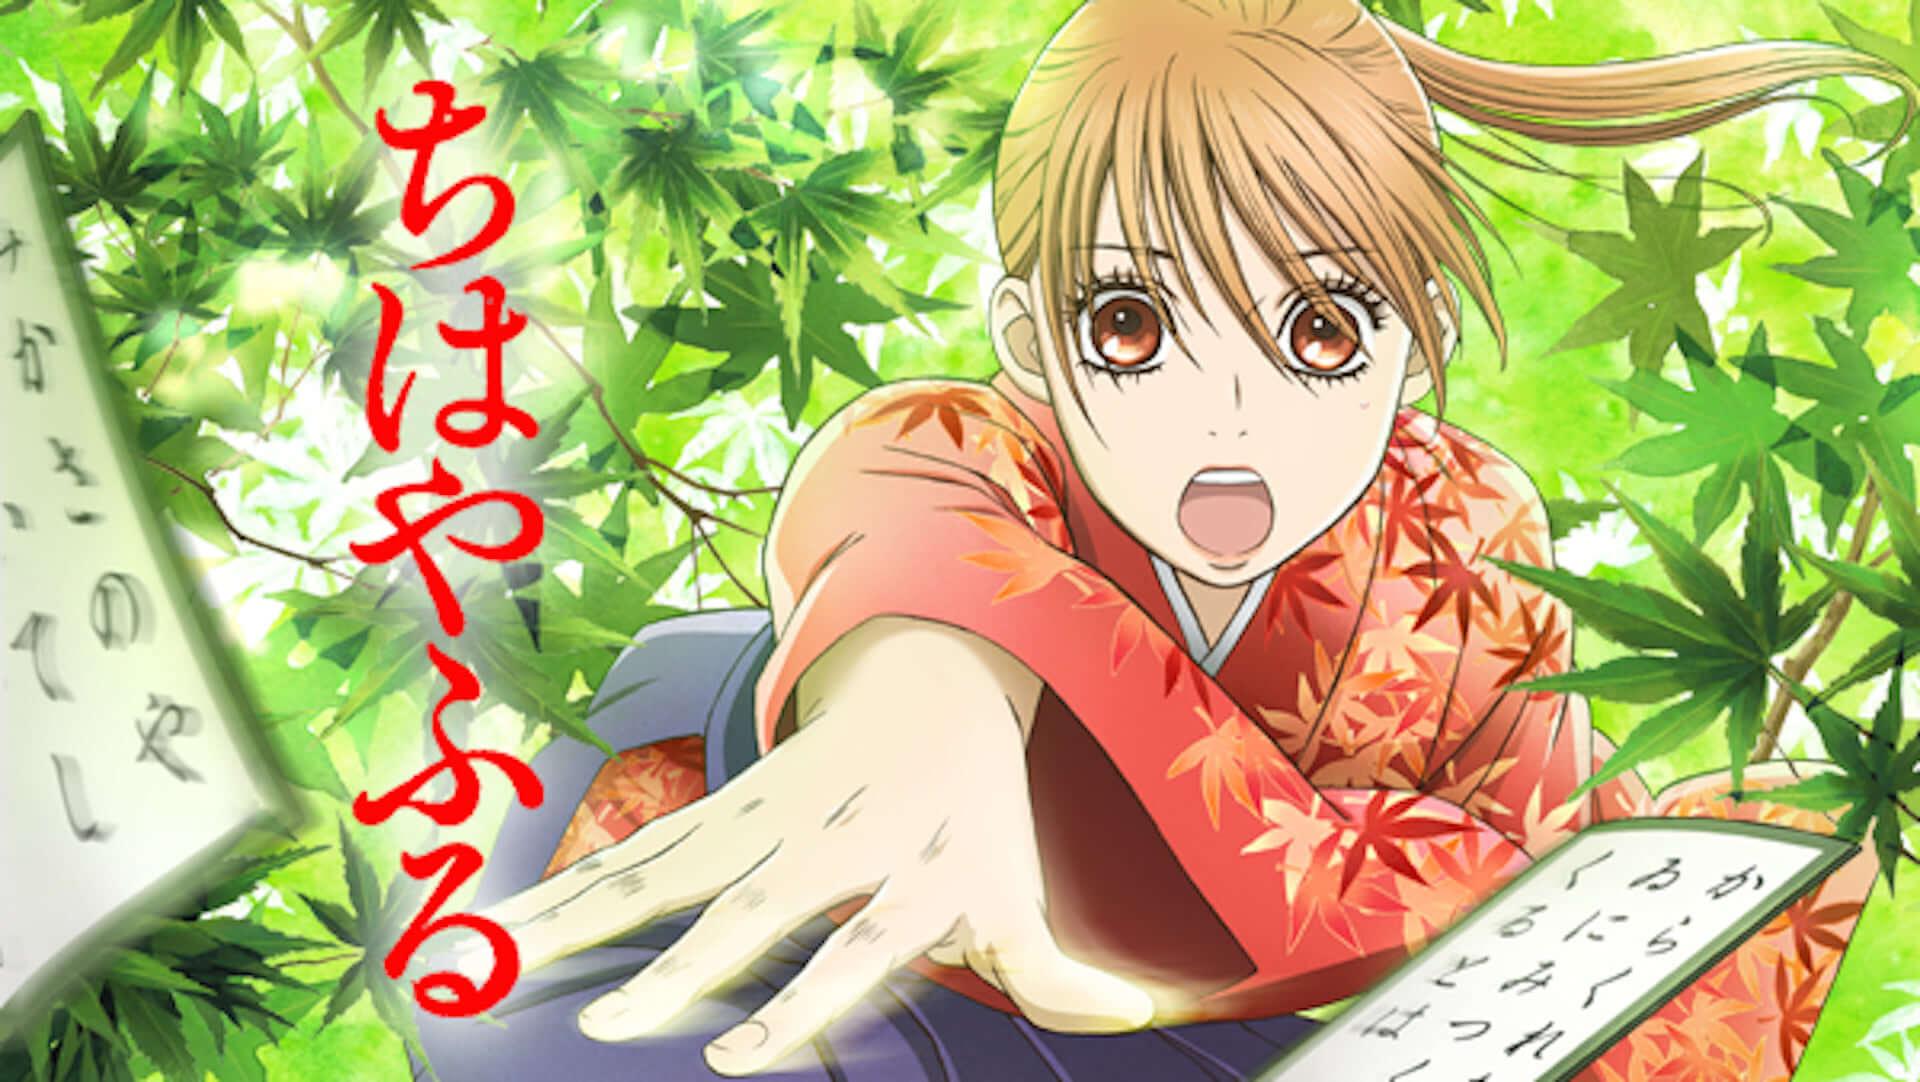 Huluの人気アニメ38作品が無料配信開始!『HUNTER×HUNTER』『ちはやふる』『デスノート』『宇宙兄弟』『はじめの一歩』も見放題 art200417_hulu_anime_2-1920x1082